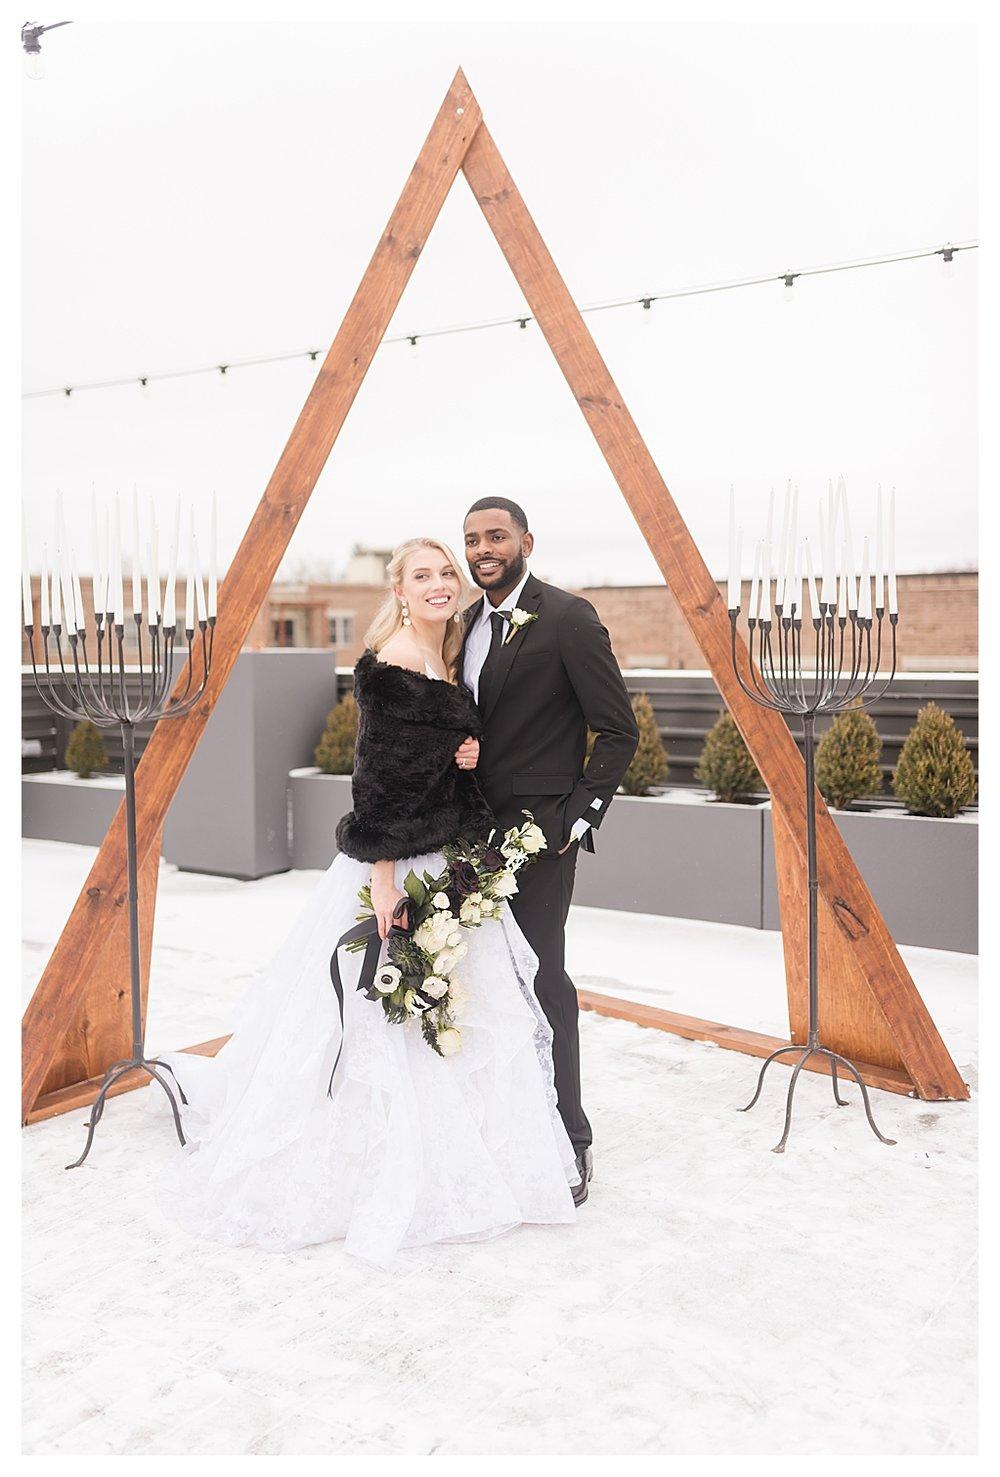 Elegant Black and White Winter Rooftop Wedding_0836.jpg